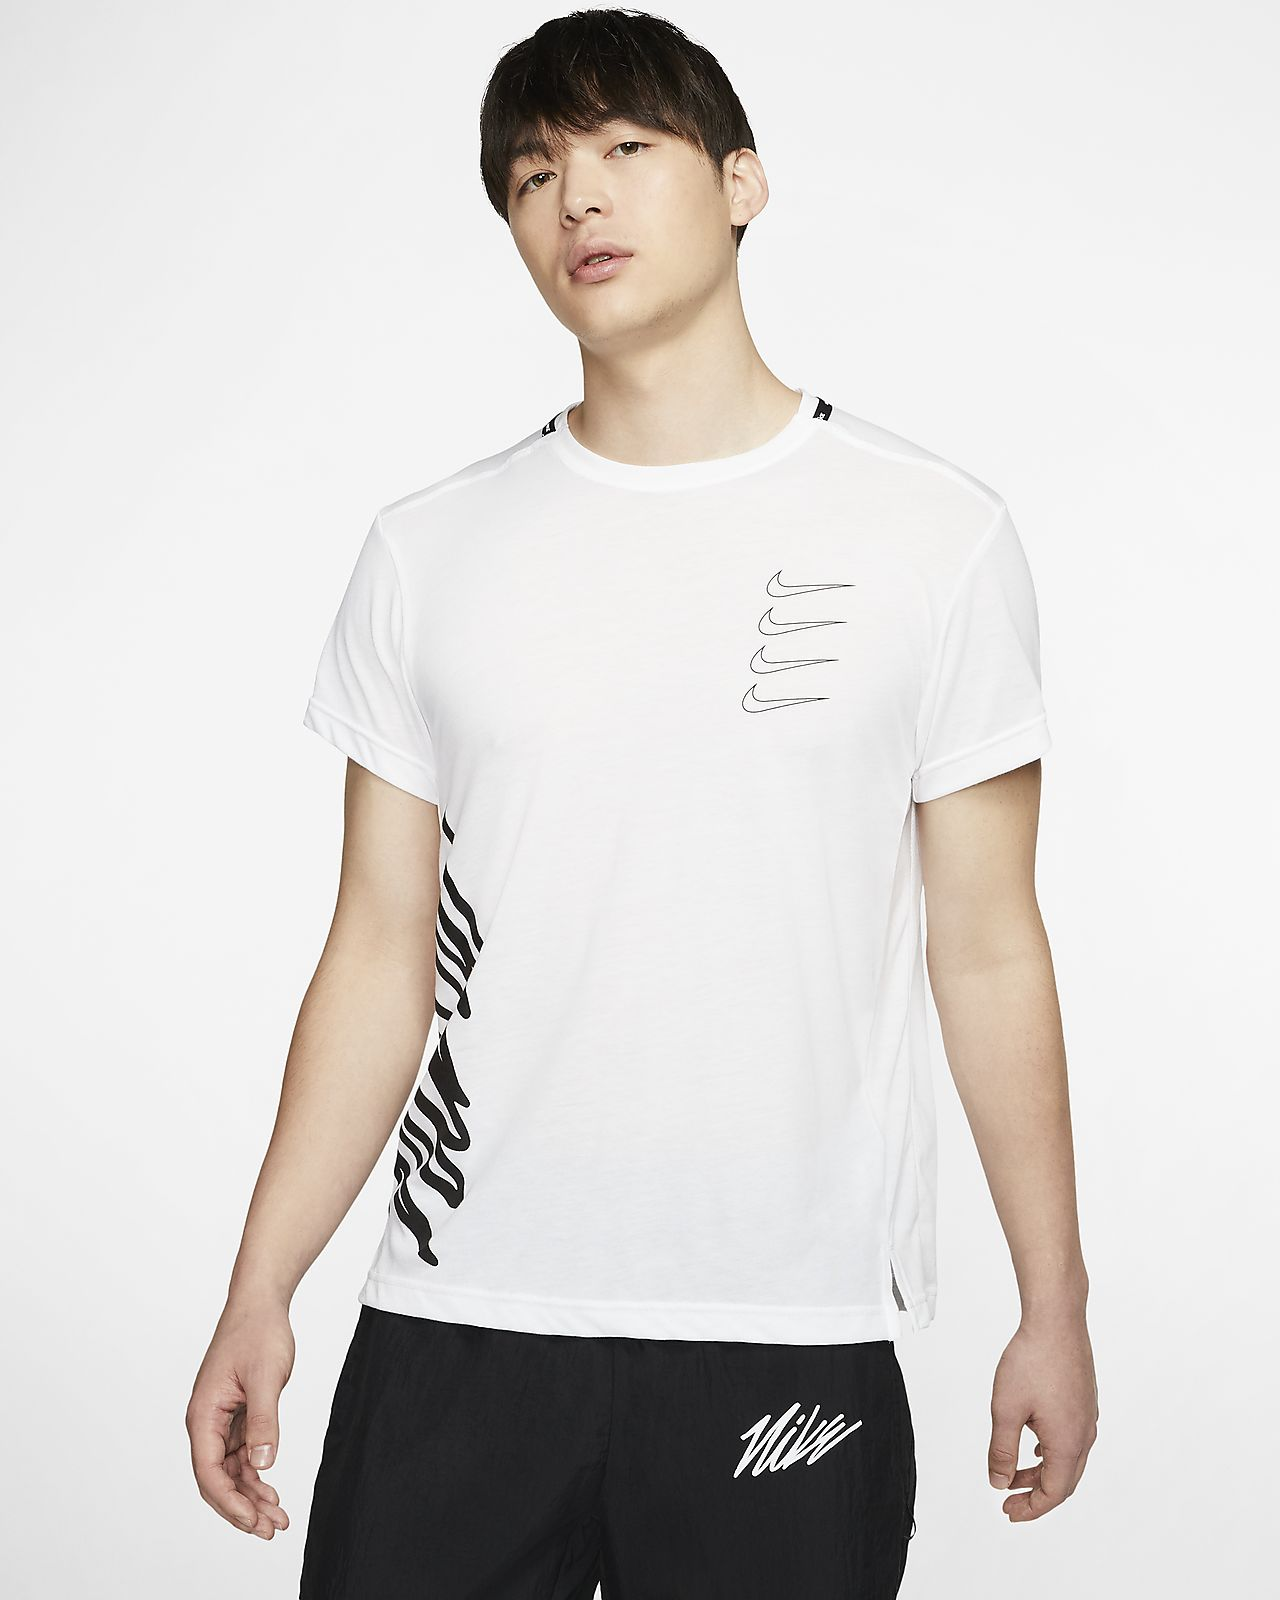 Мужская футболка с коротким рукавом для тренинга Nike